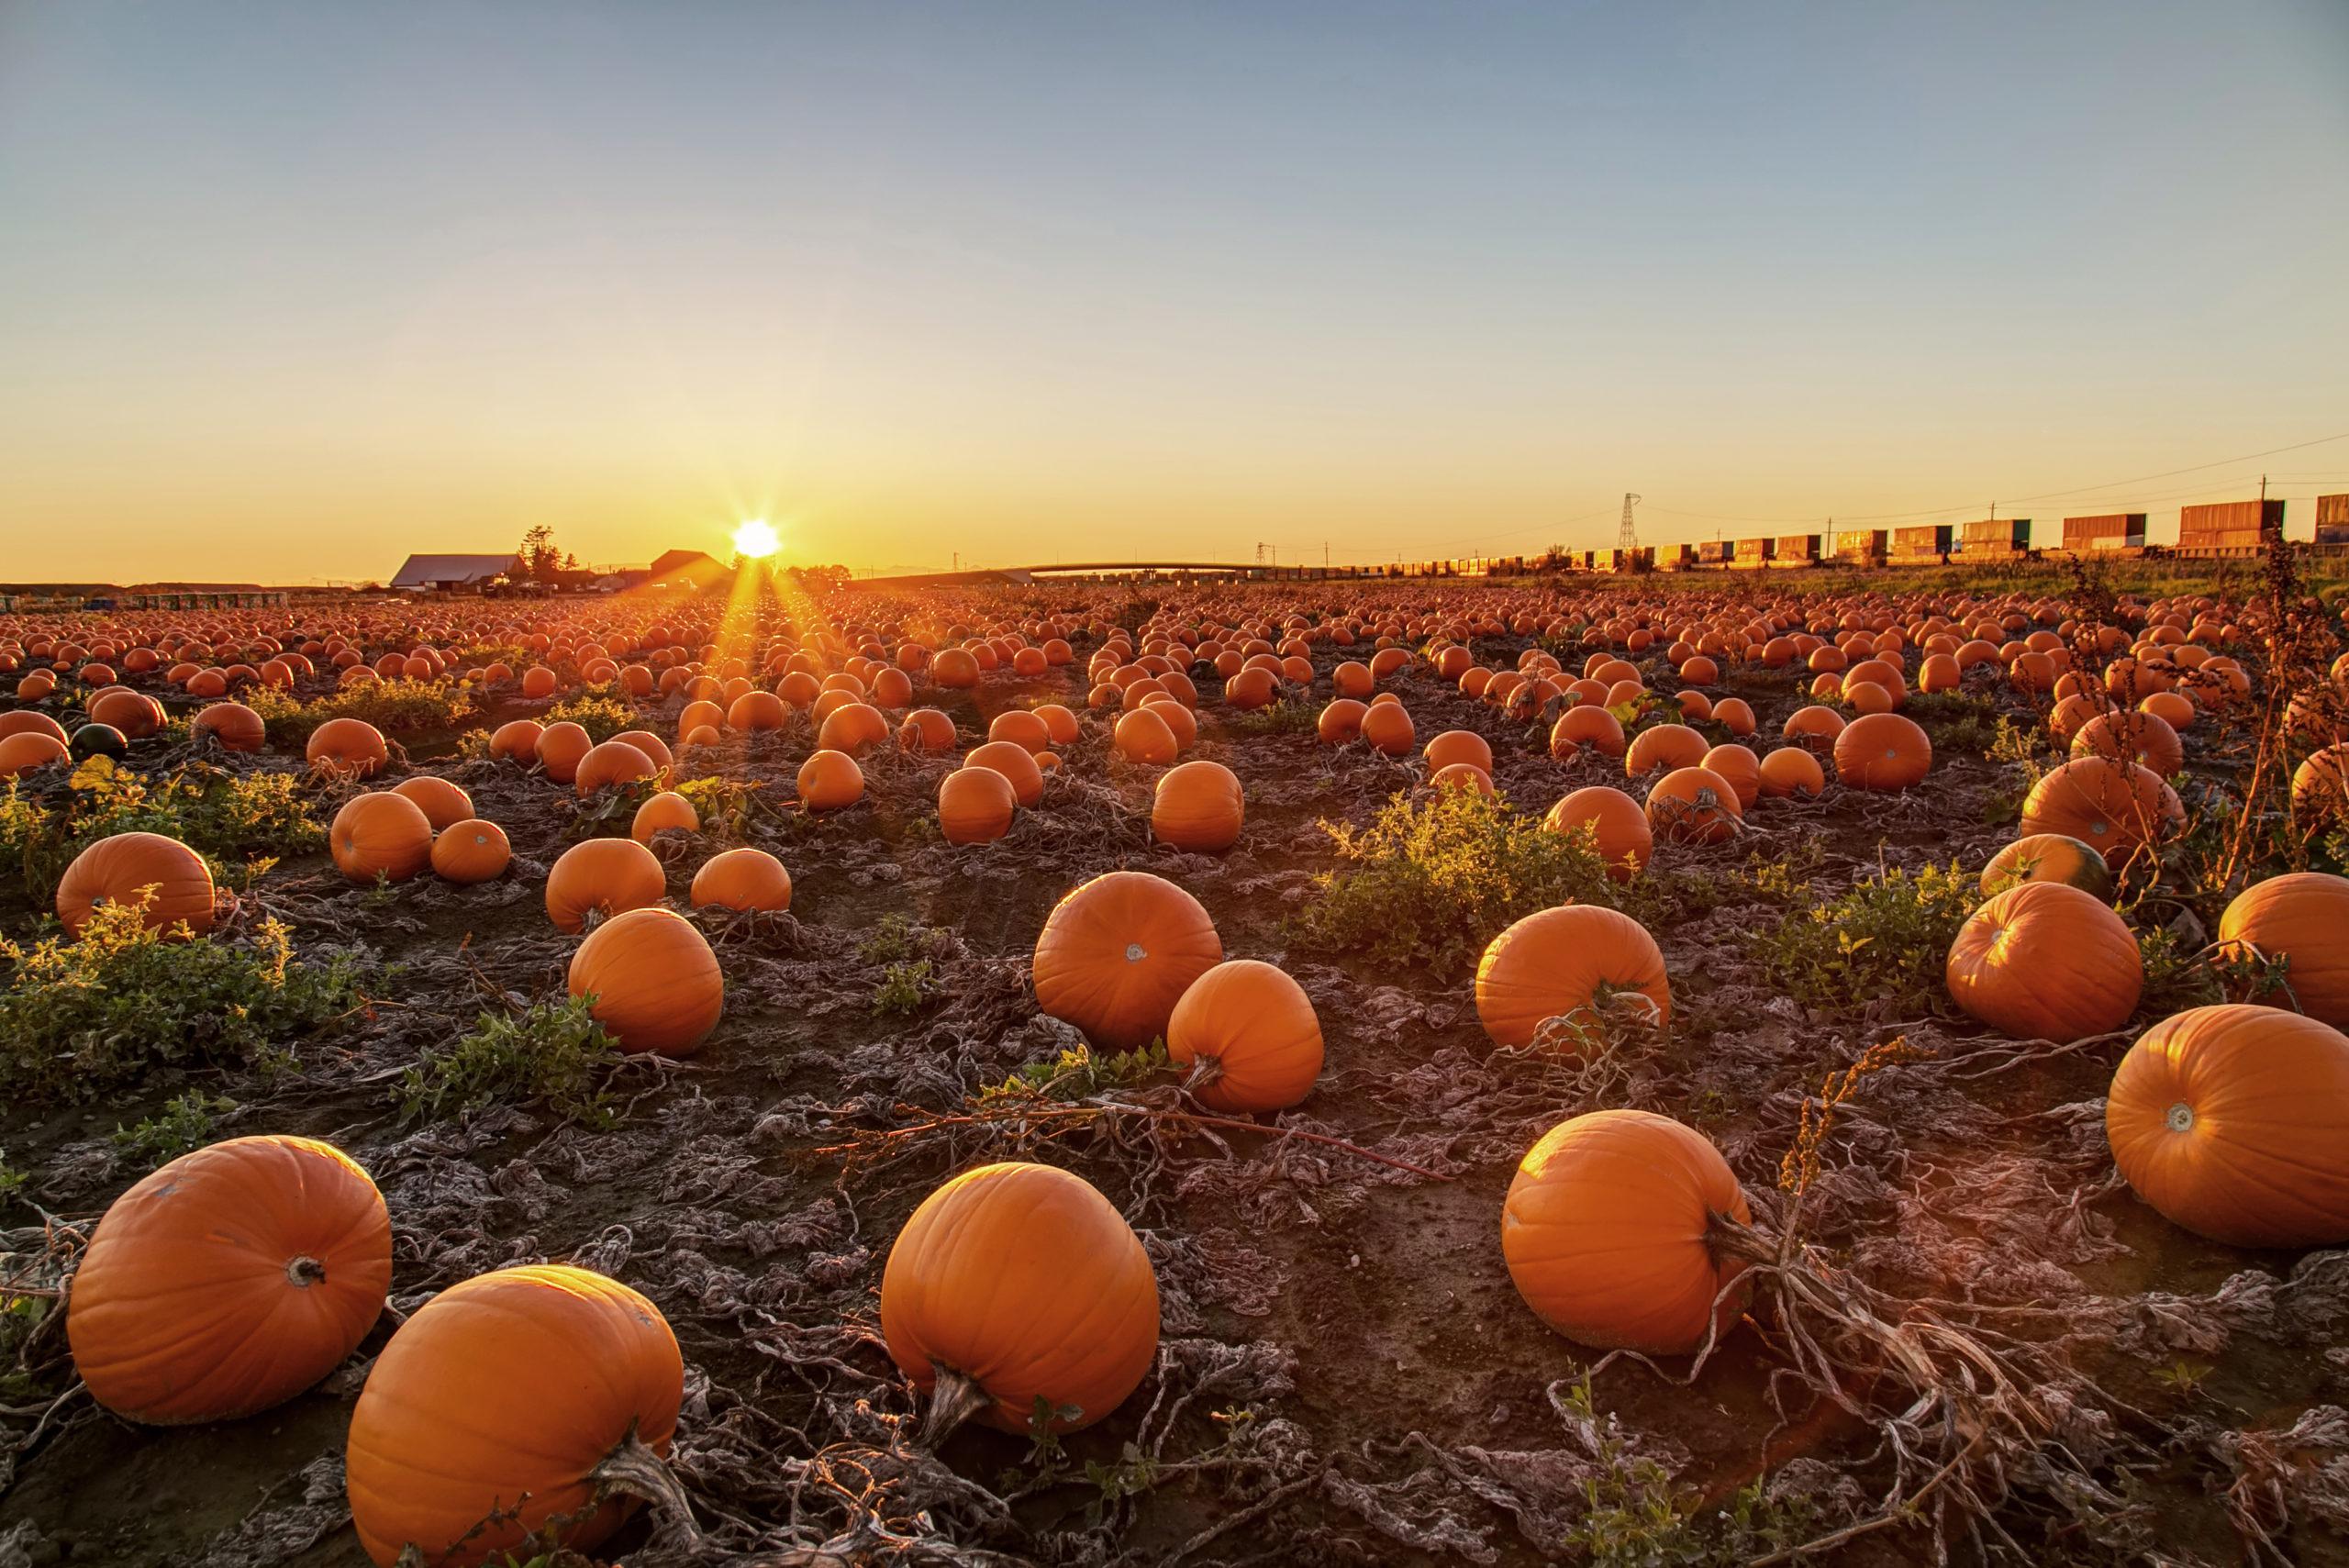 Is a pumpkin shortage coming???